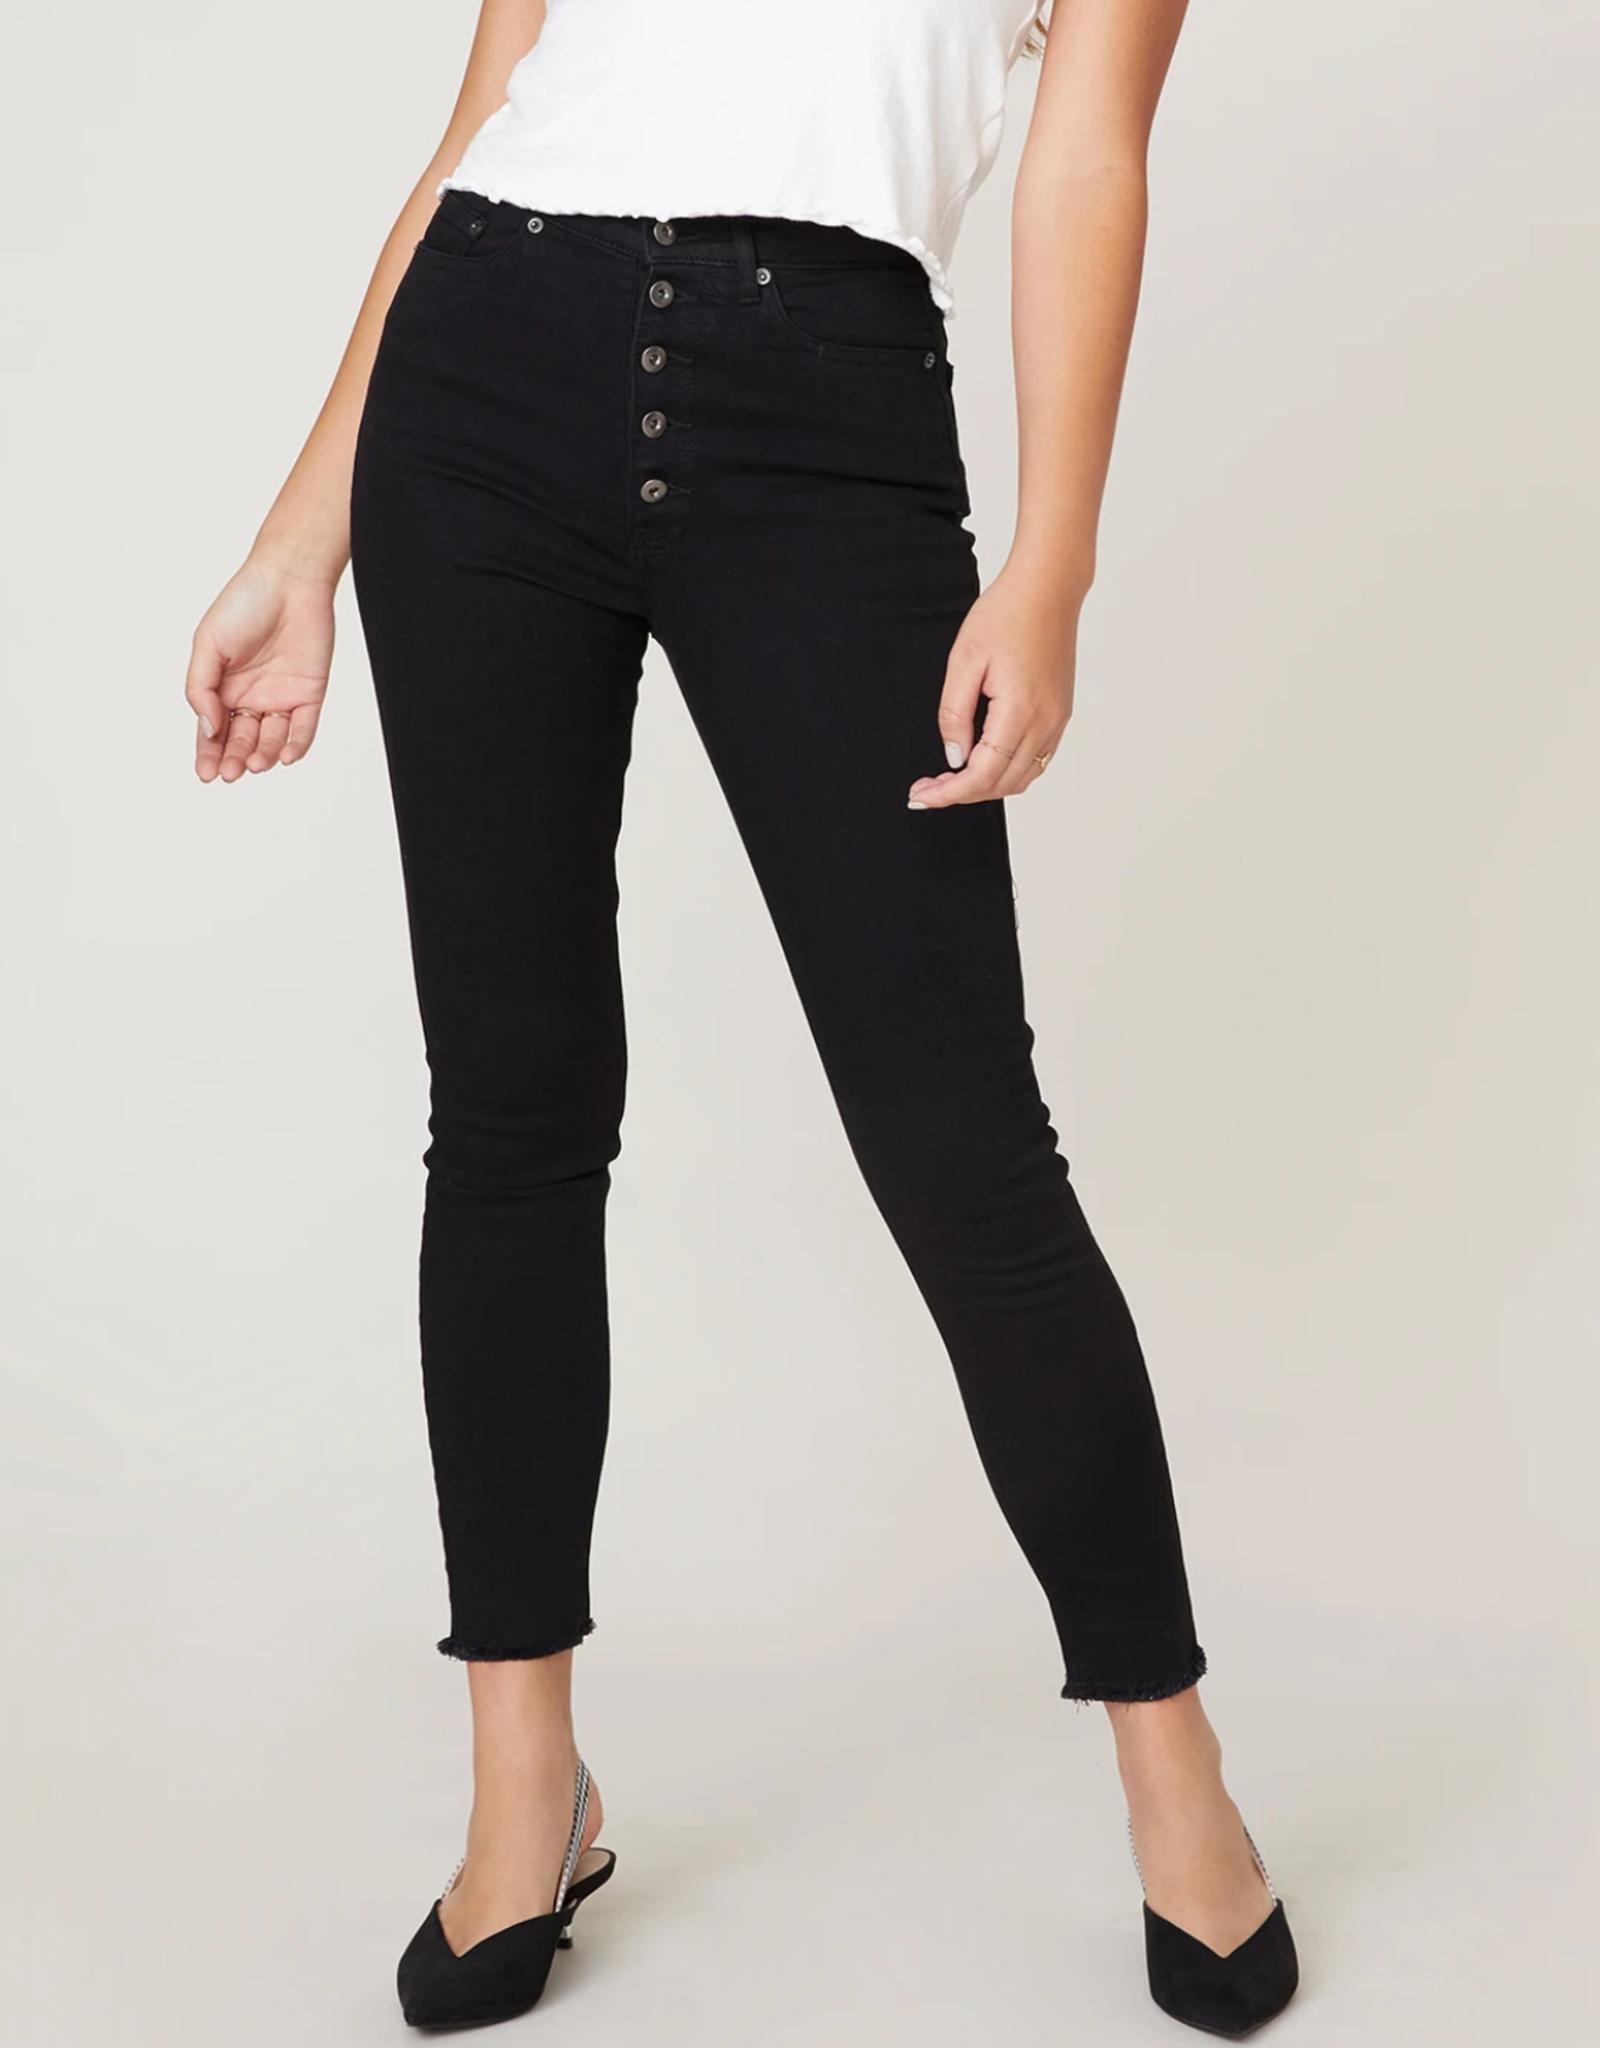 BB Dakota Late-Riser Hi-Rise Jeans